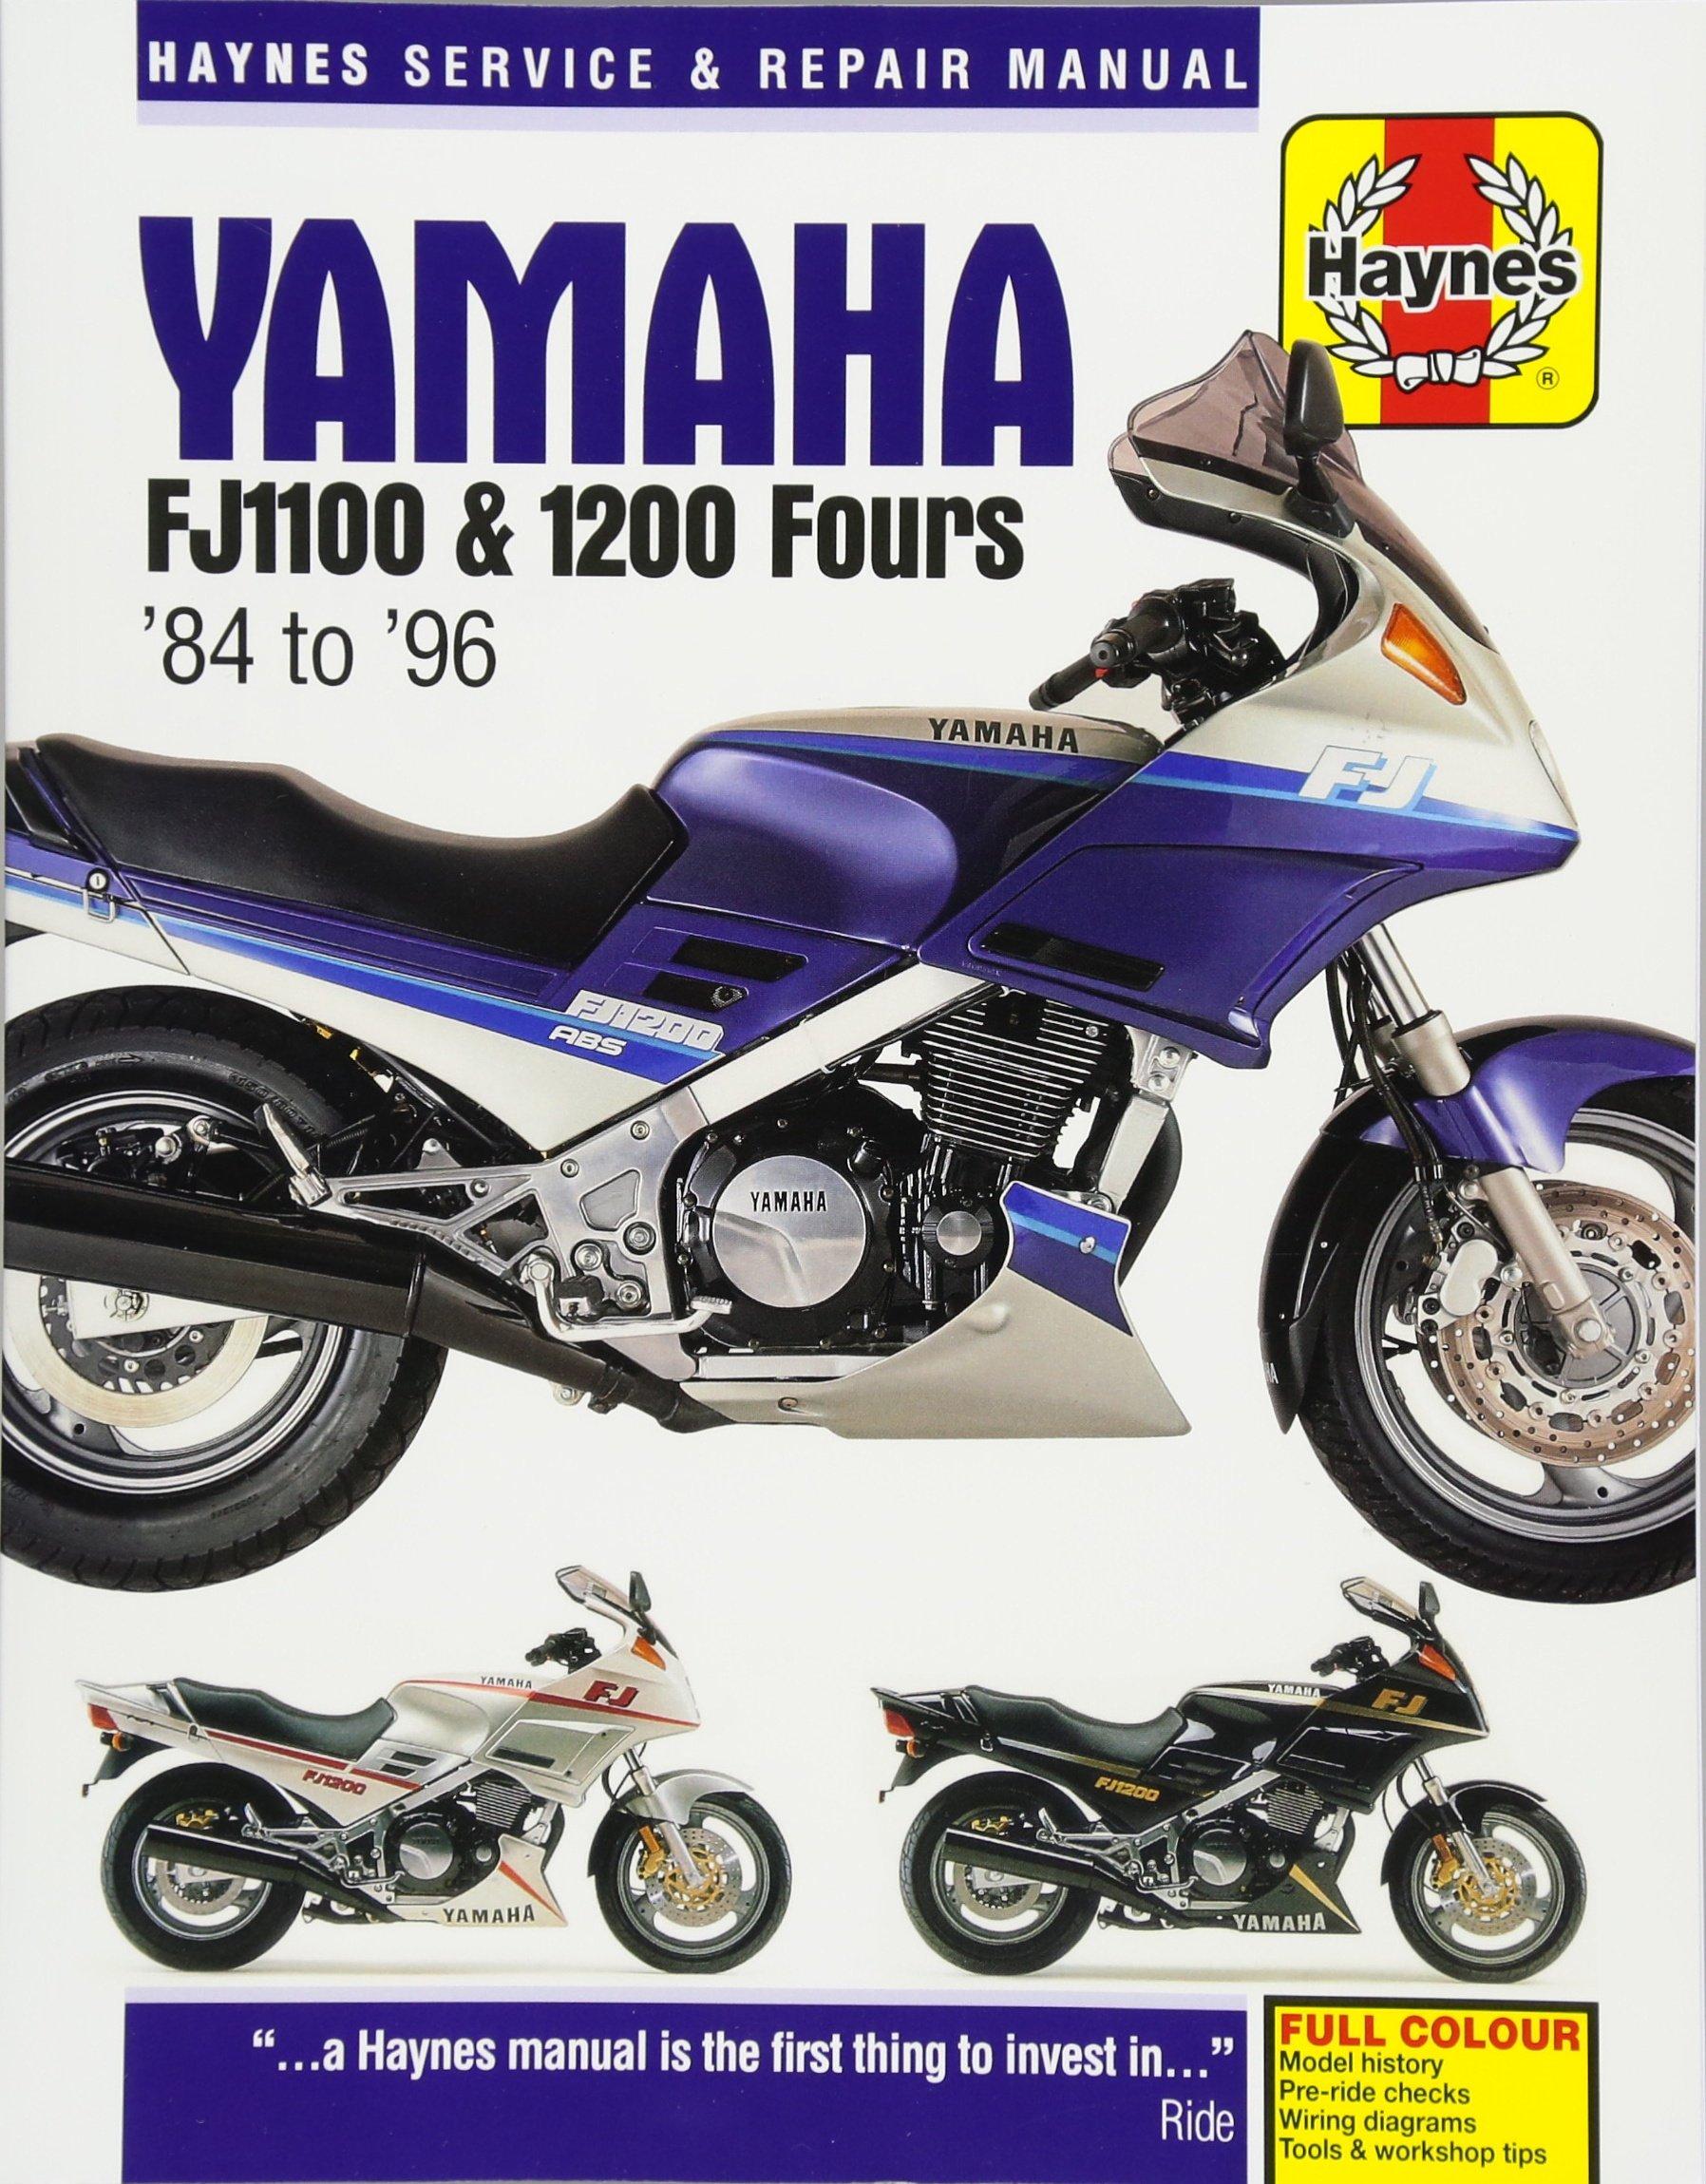 Fj1100 Wiring Diagram Schematics Yamaha Dt360 1200 Fours 84 To 96 Haynes Service Repair Light